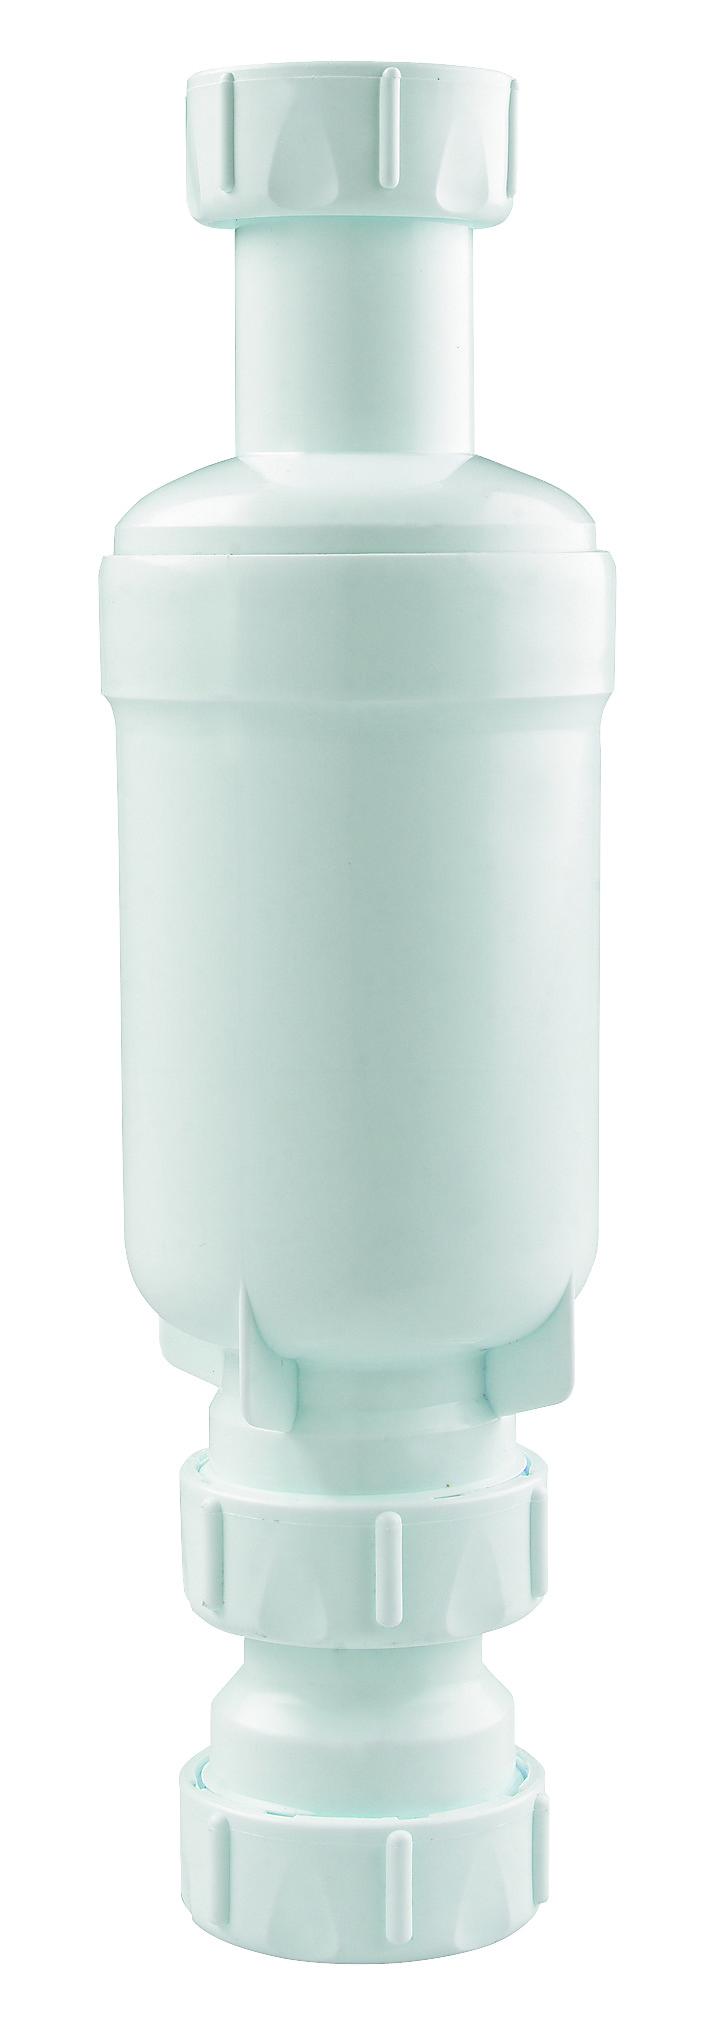 32mm Hunter Straight Through Pedestal Trap Aquatech Heating Solutions Ltd